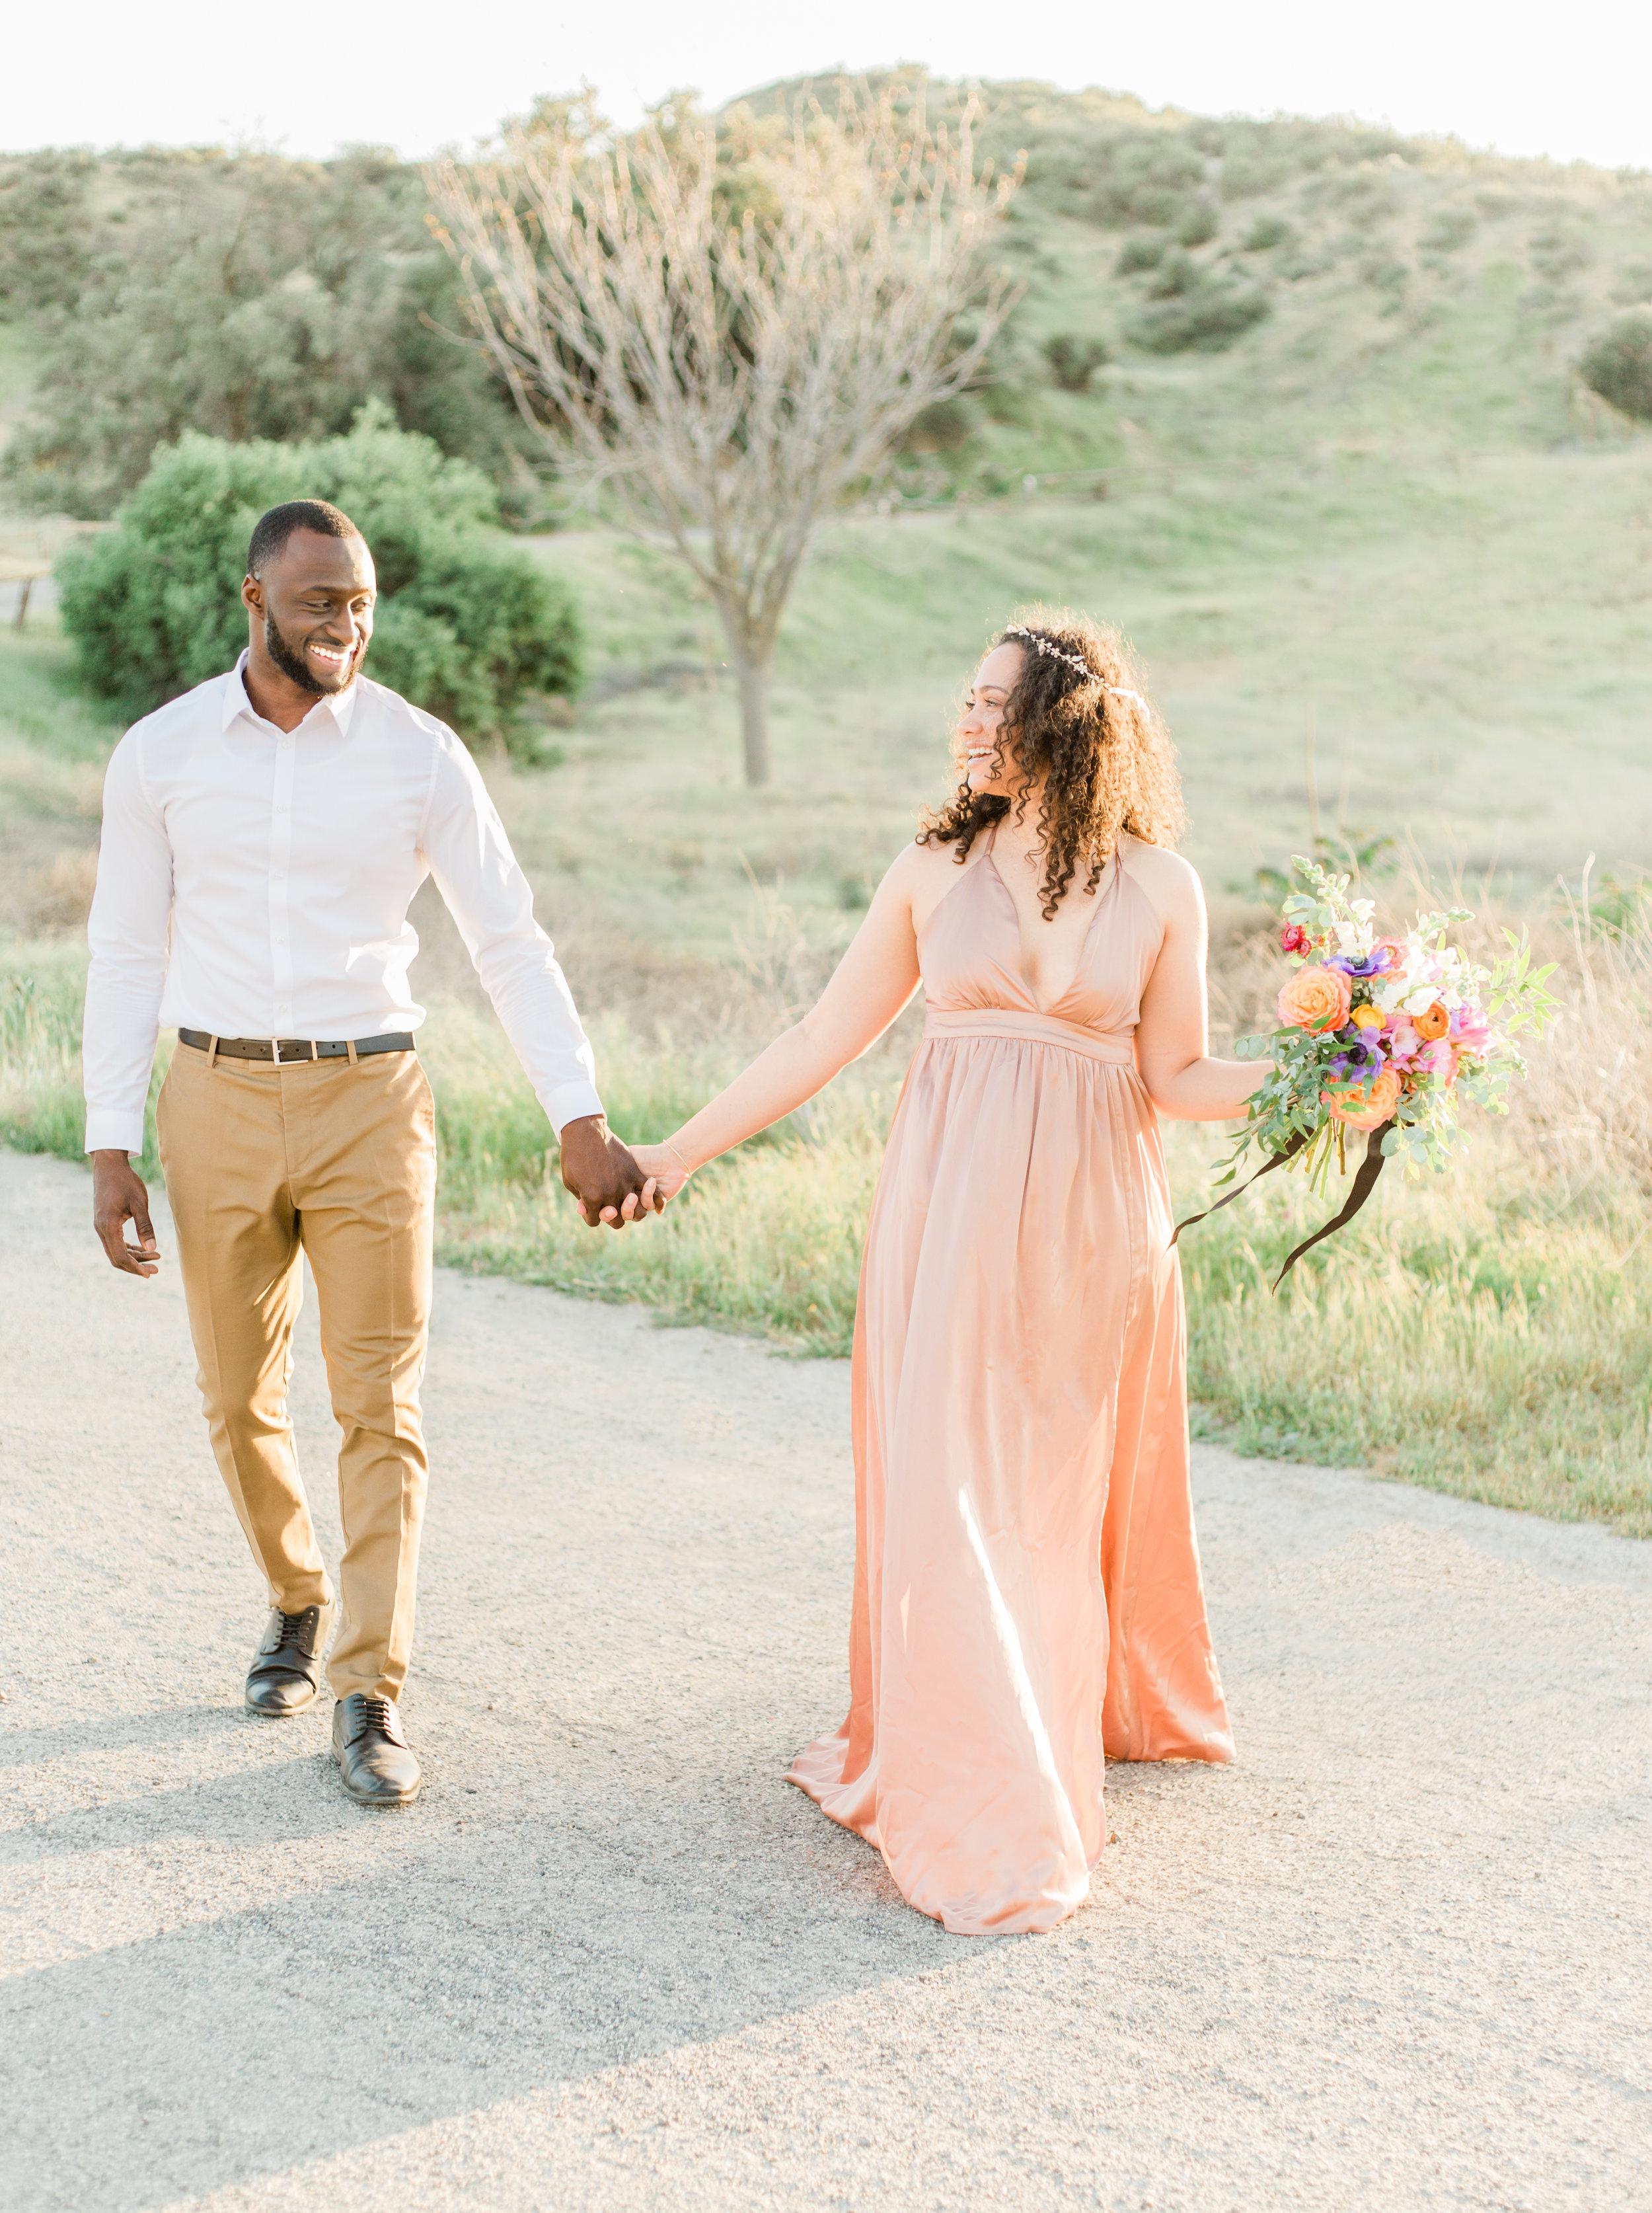 Temecula couples photographer